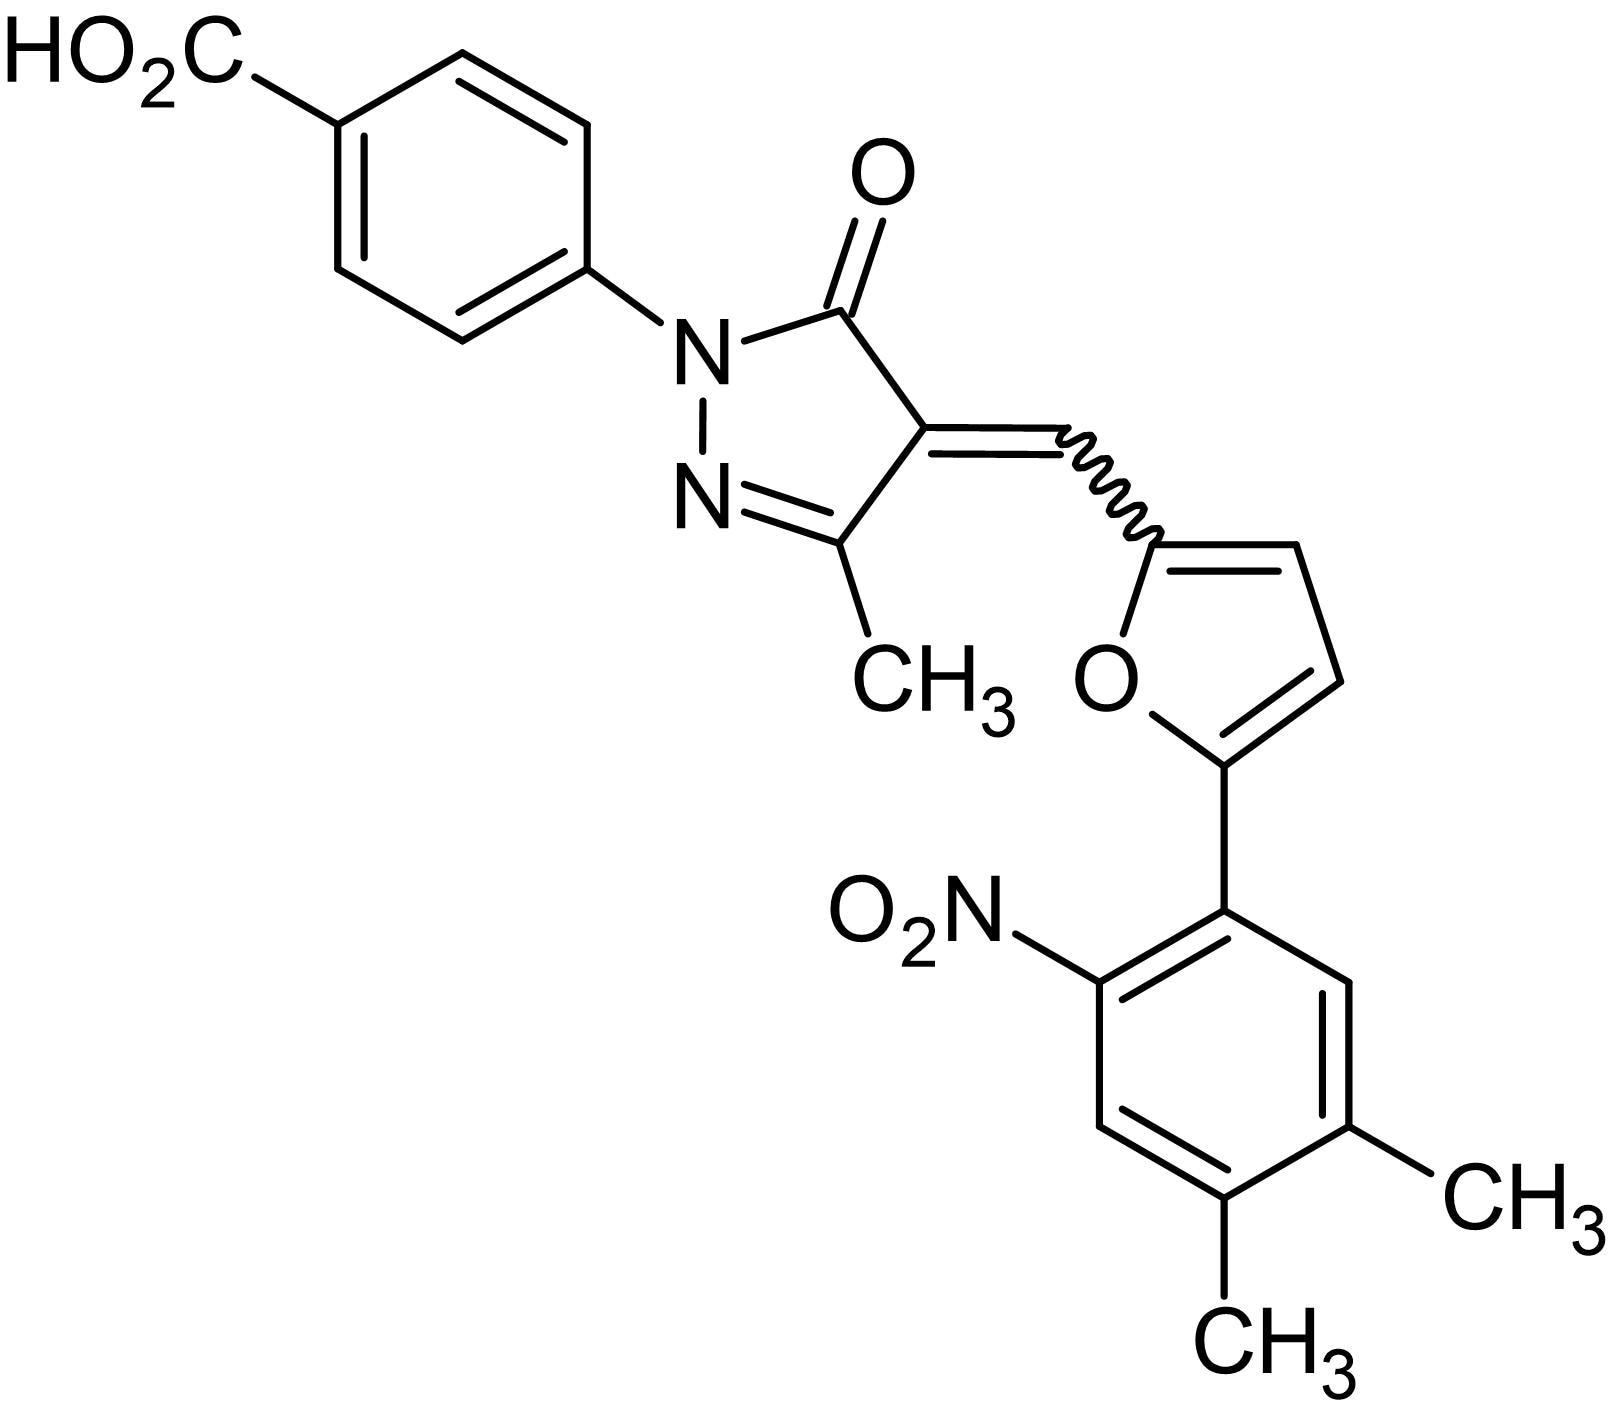 Chemical Structure - C 646, p300/CBP Inhibitor, p300/CBP HAT inhibitor (ab142163)